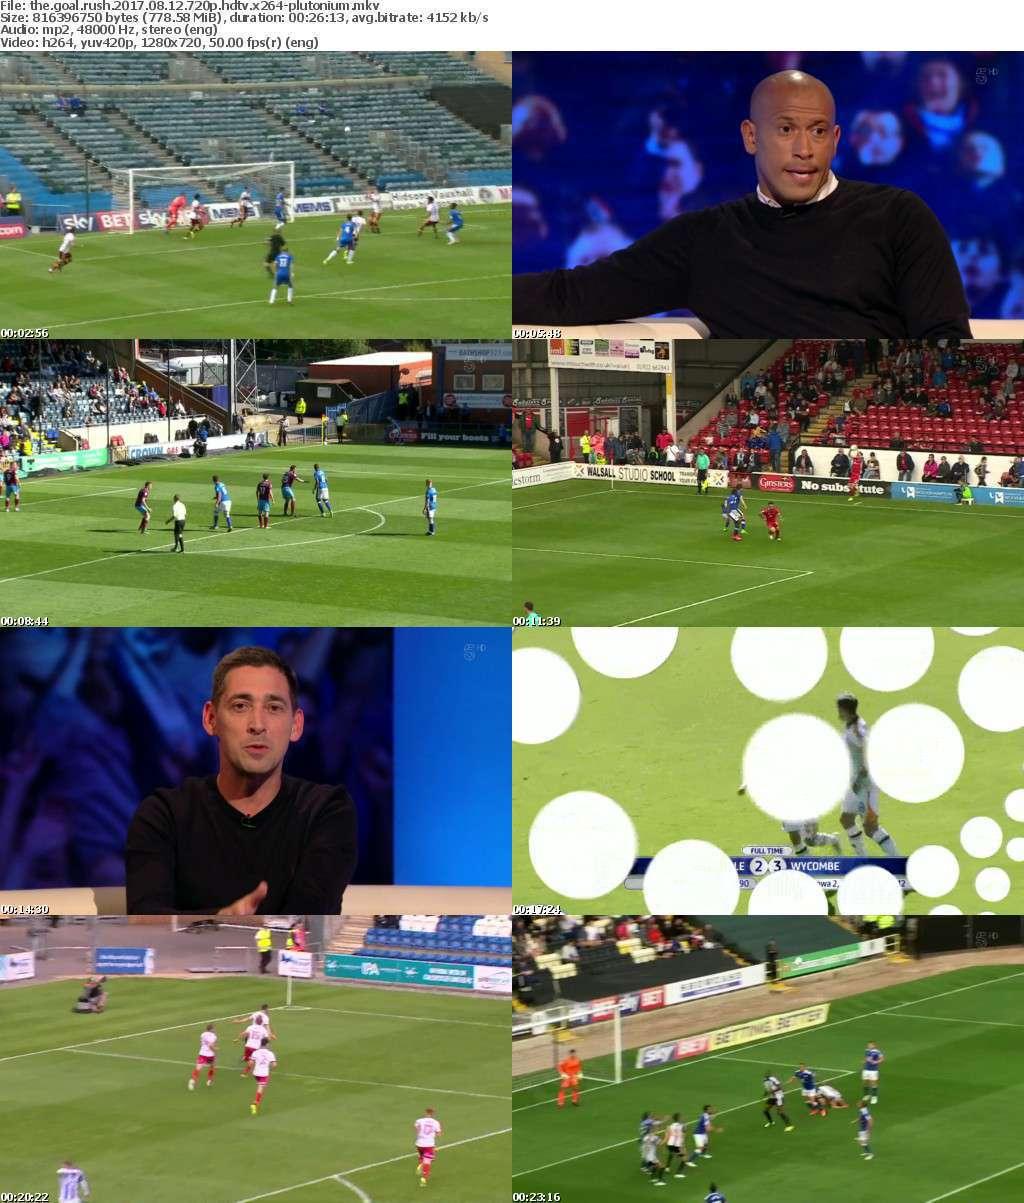 The Goal Rush 2017 08 12 720p HDTV x264-PLUTONiUM